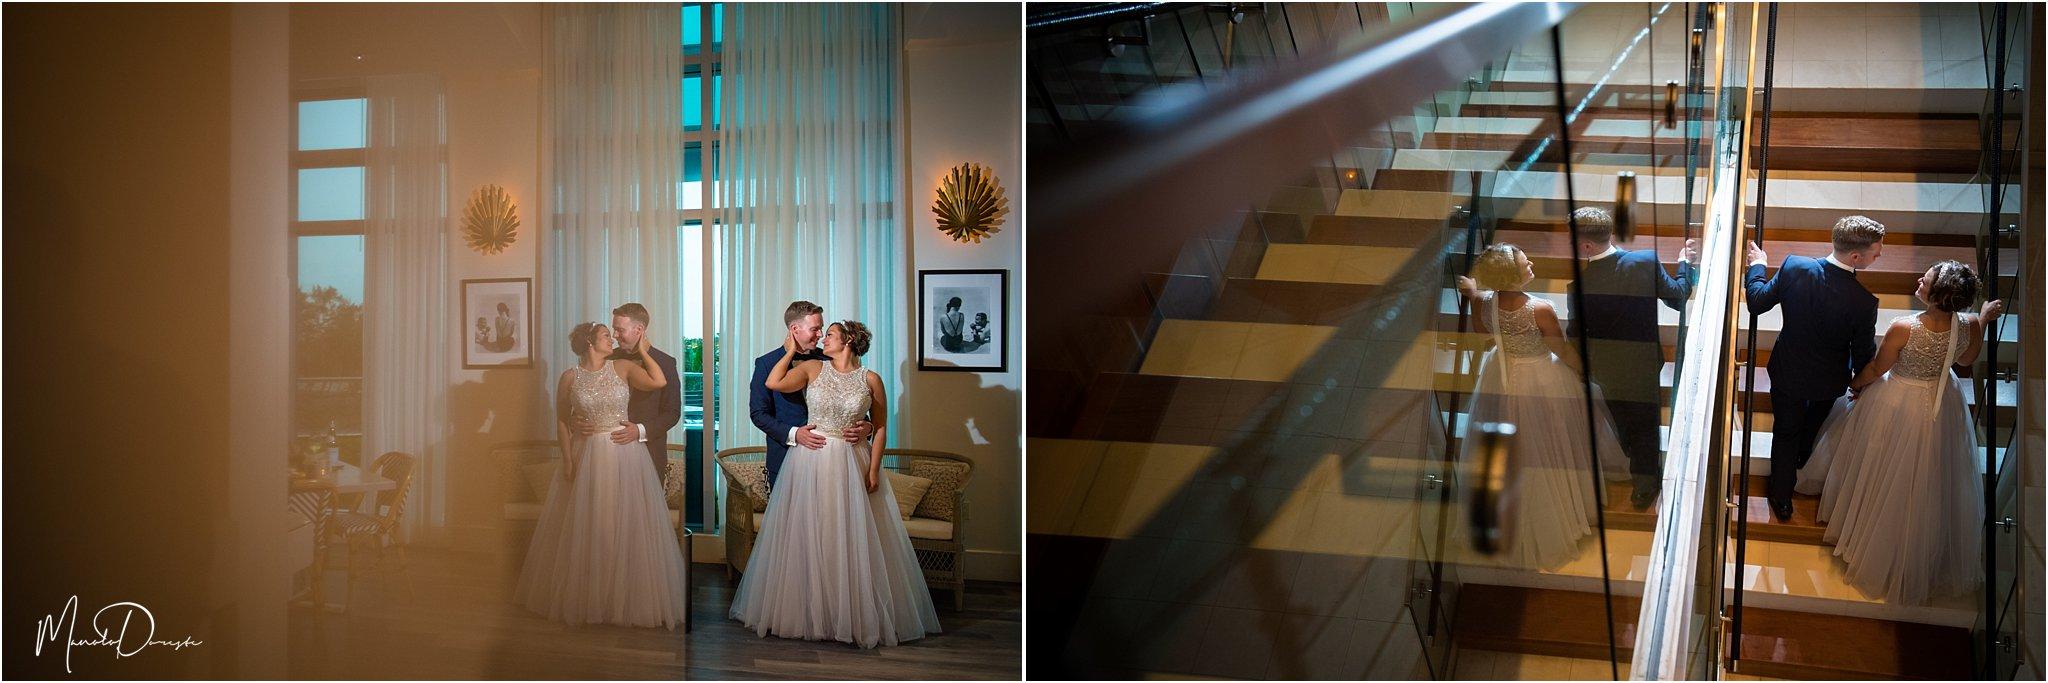 0461_ManoloDoreste_InFocusStudios_Wedding_Family_Photography_Miami_MiamiPhotographer.jpg